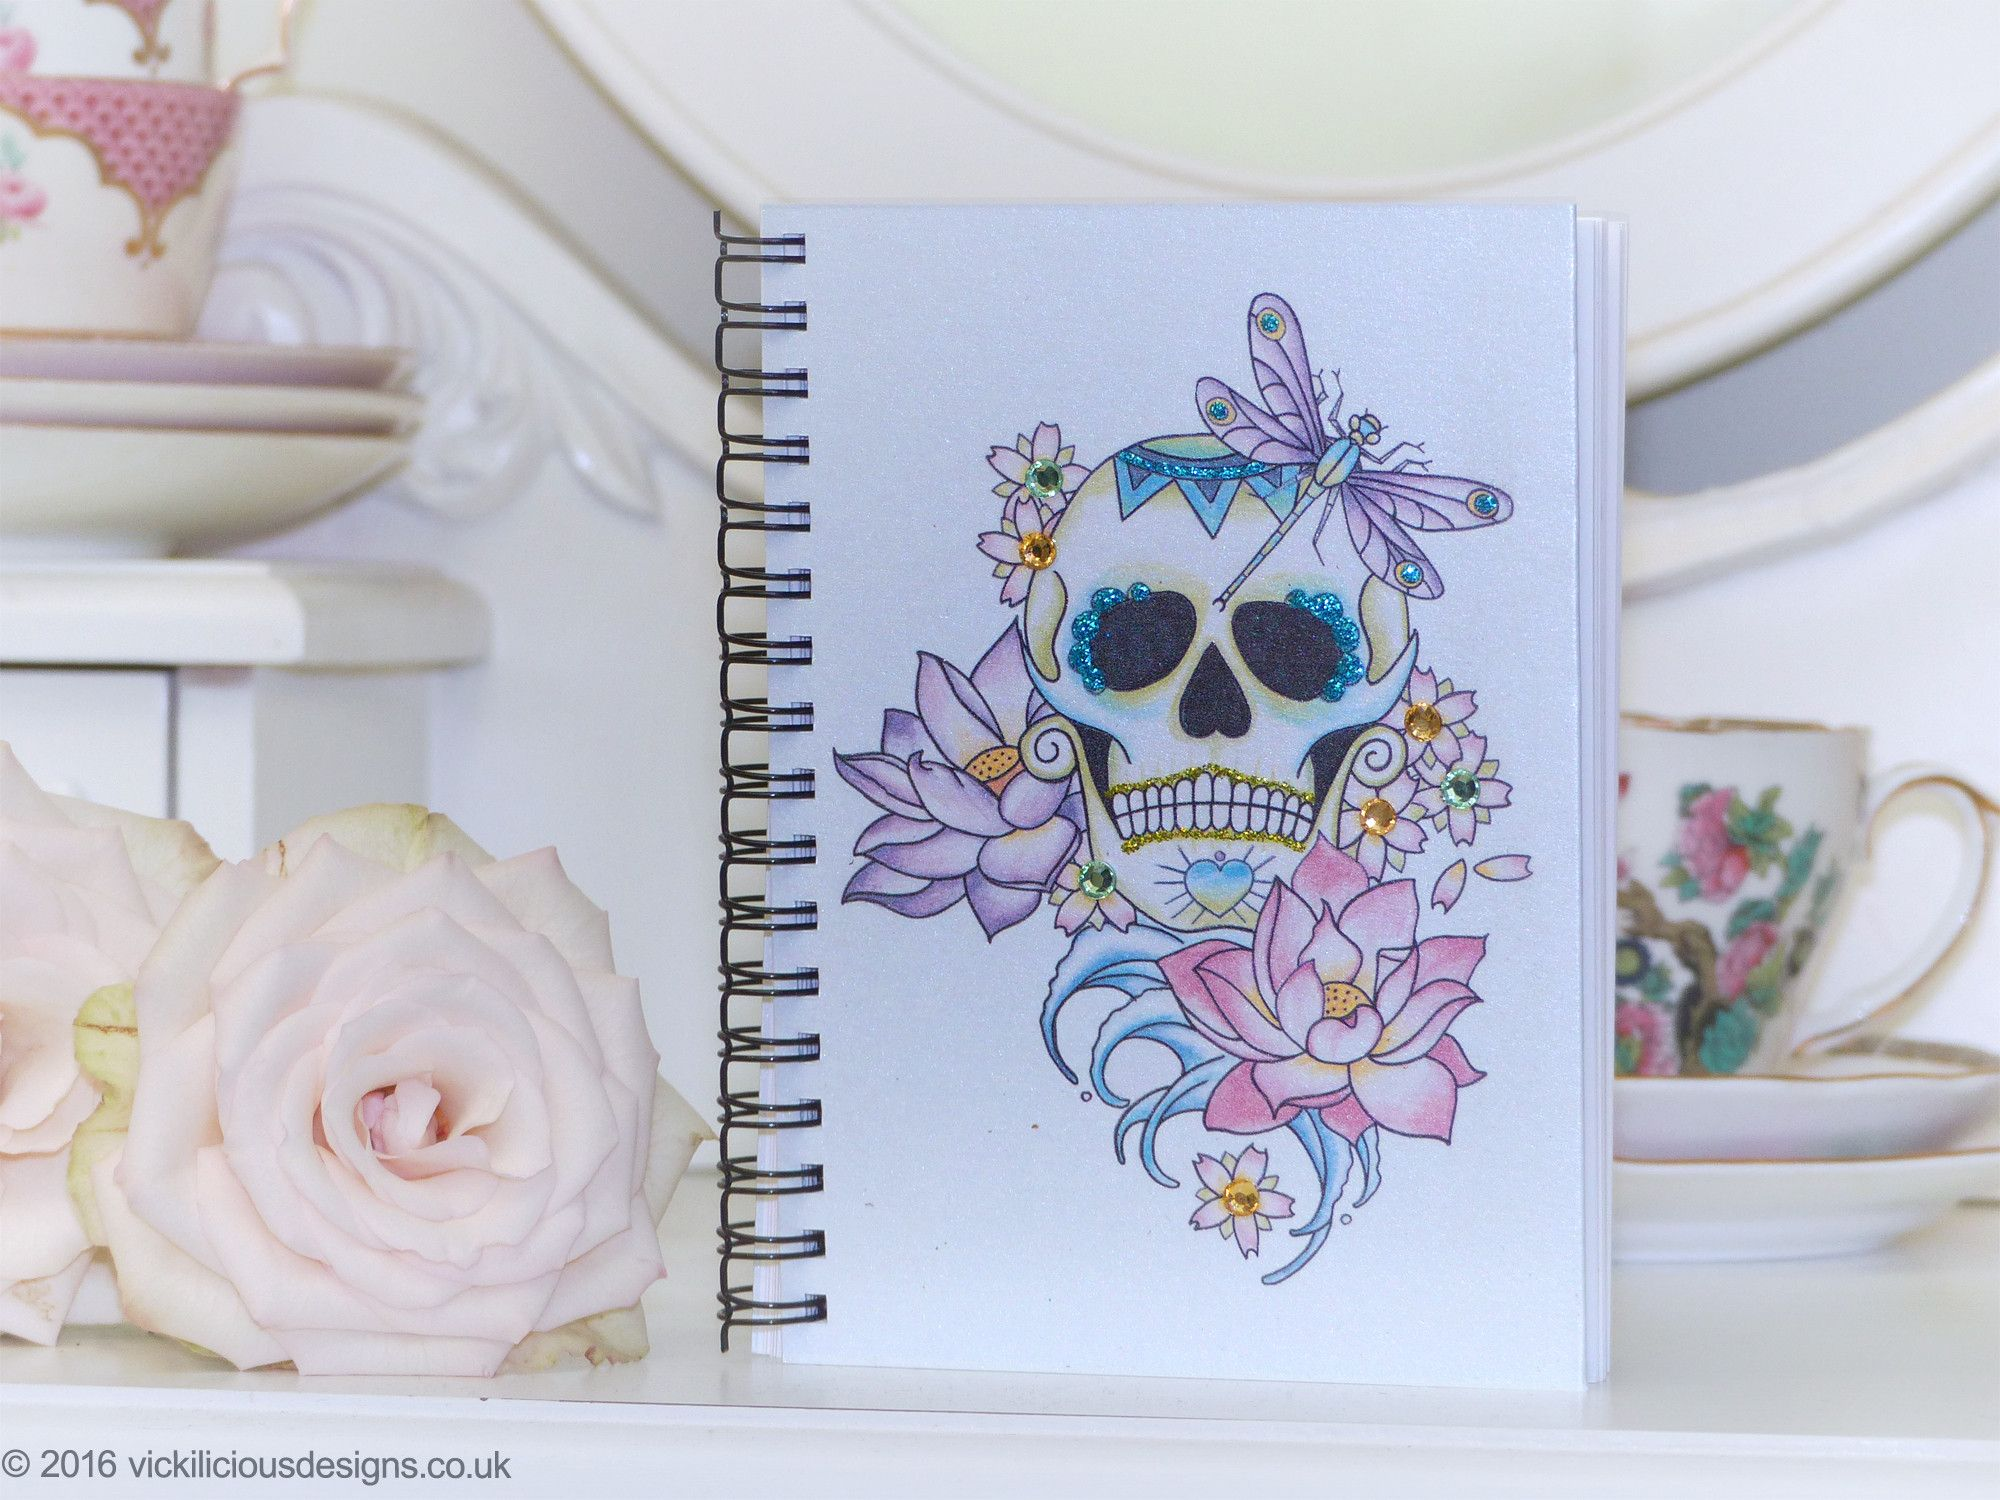 Lotus flower sugar skull tattoo day of the dead handmade a6 lotus flower sugar skull tattoo day of the dead handmade a6 notebook dhlflorist Gallery